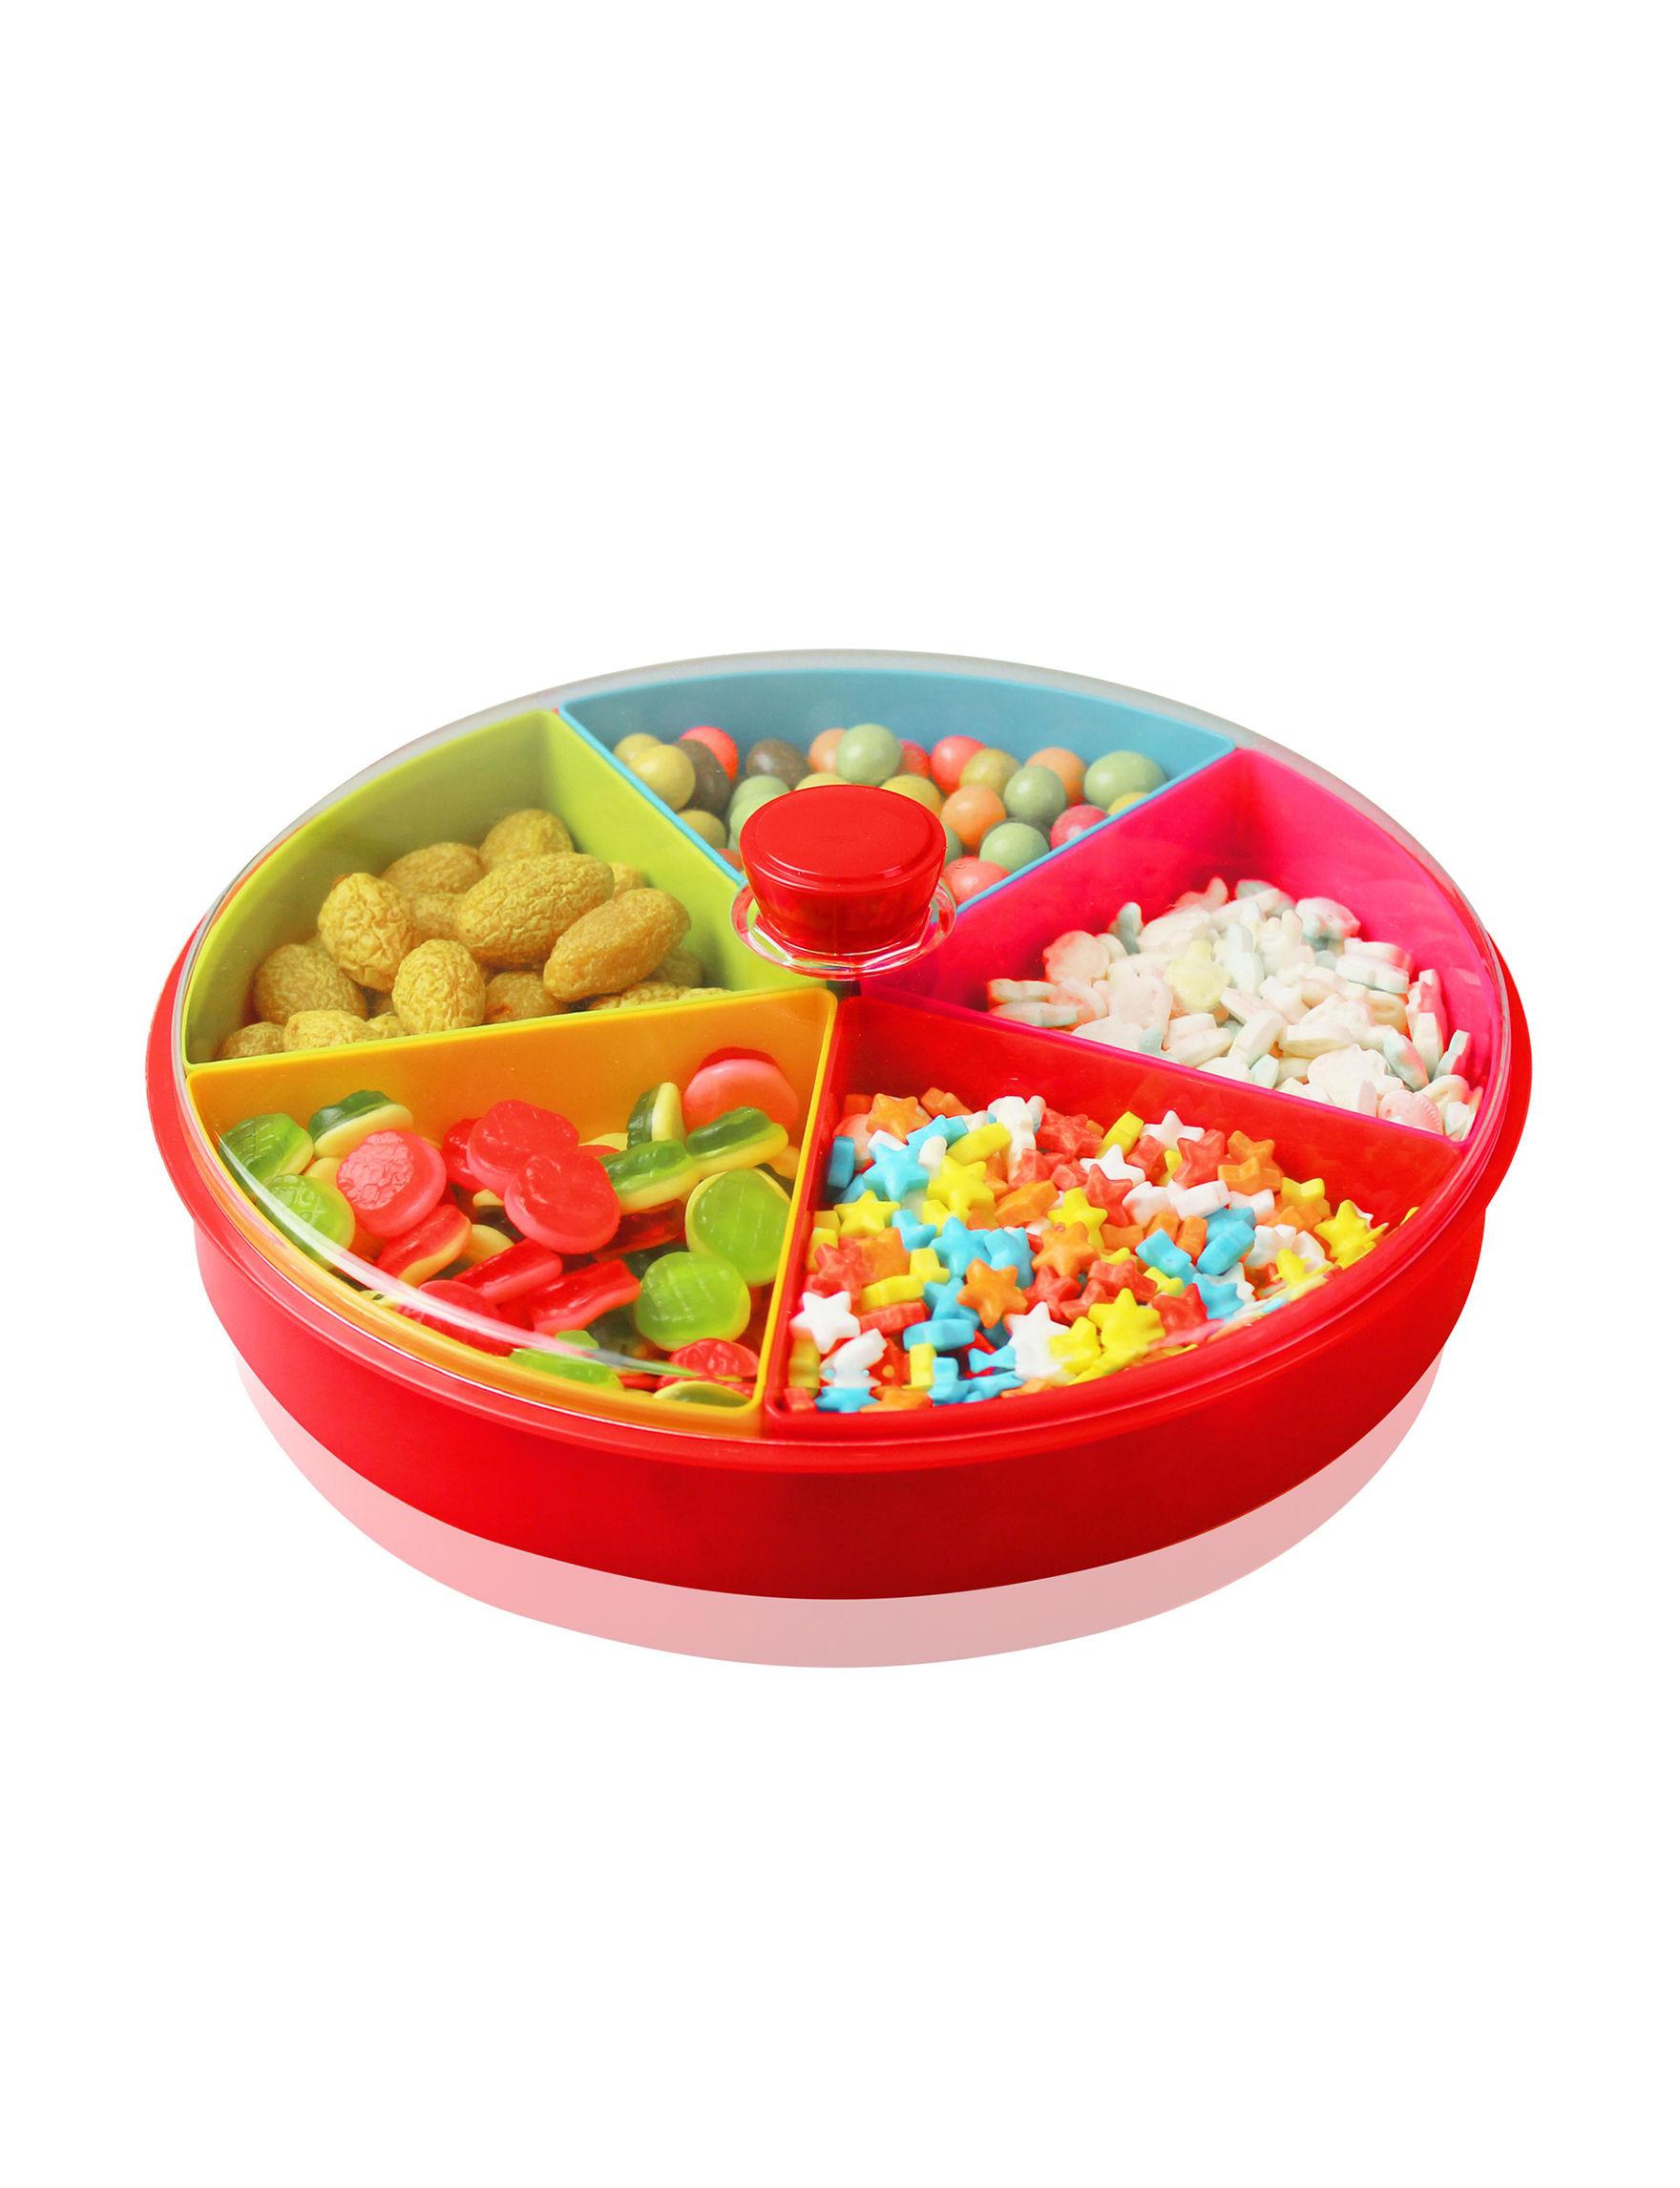 Grand Innovation Red Serving Platters & Trays Serveware